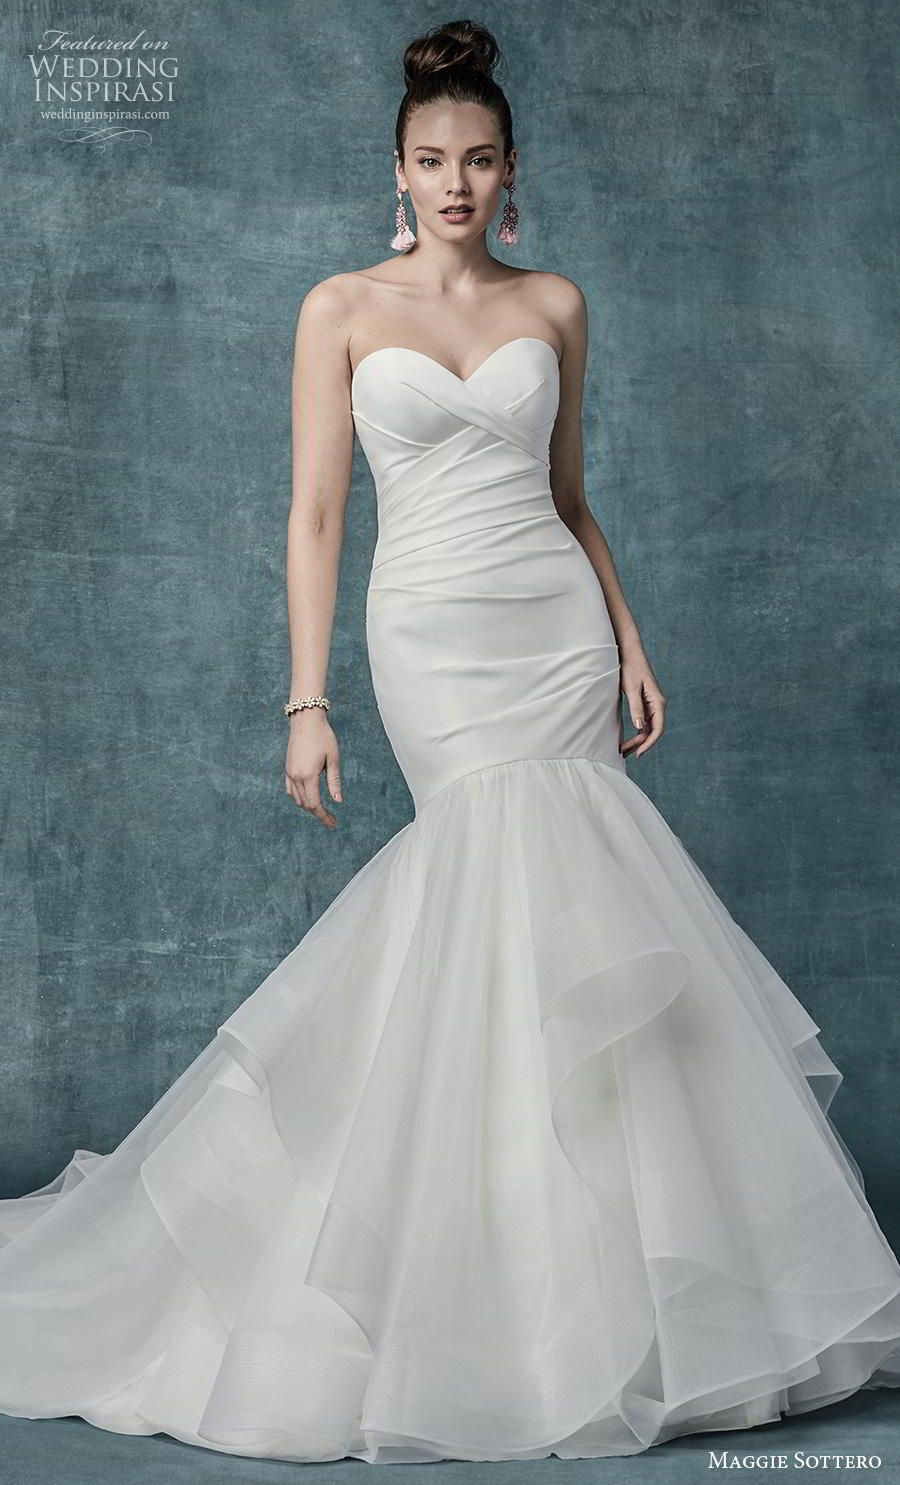 dbaef569522 maggie sottero spring 2019 bridal strapless sweetheart neckline wrap over  ruched bodice simple elegant mermaid wedding dress mid back chapel train  (8) mv ...